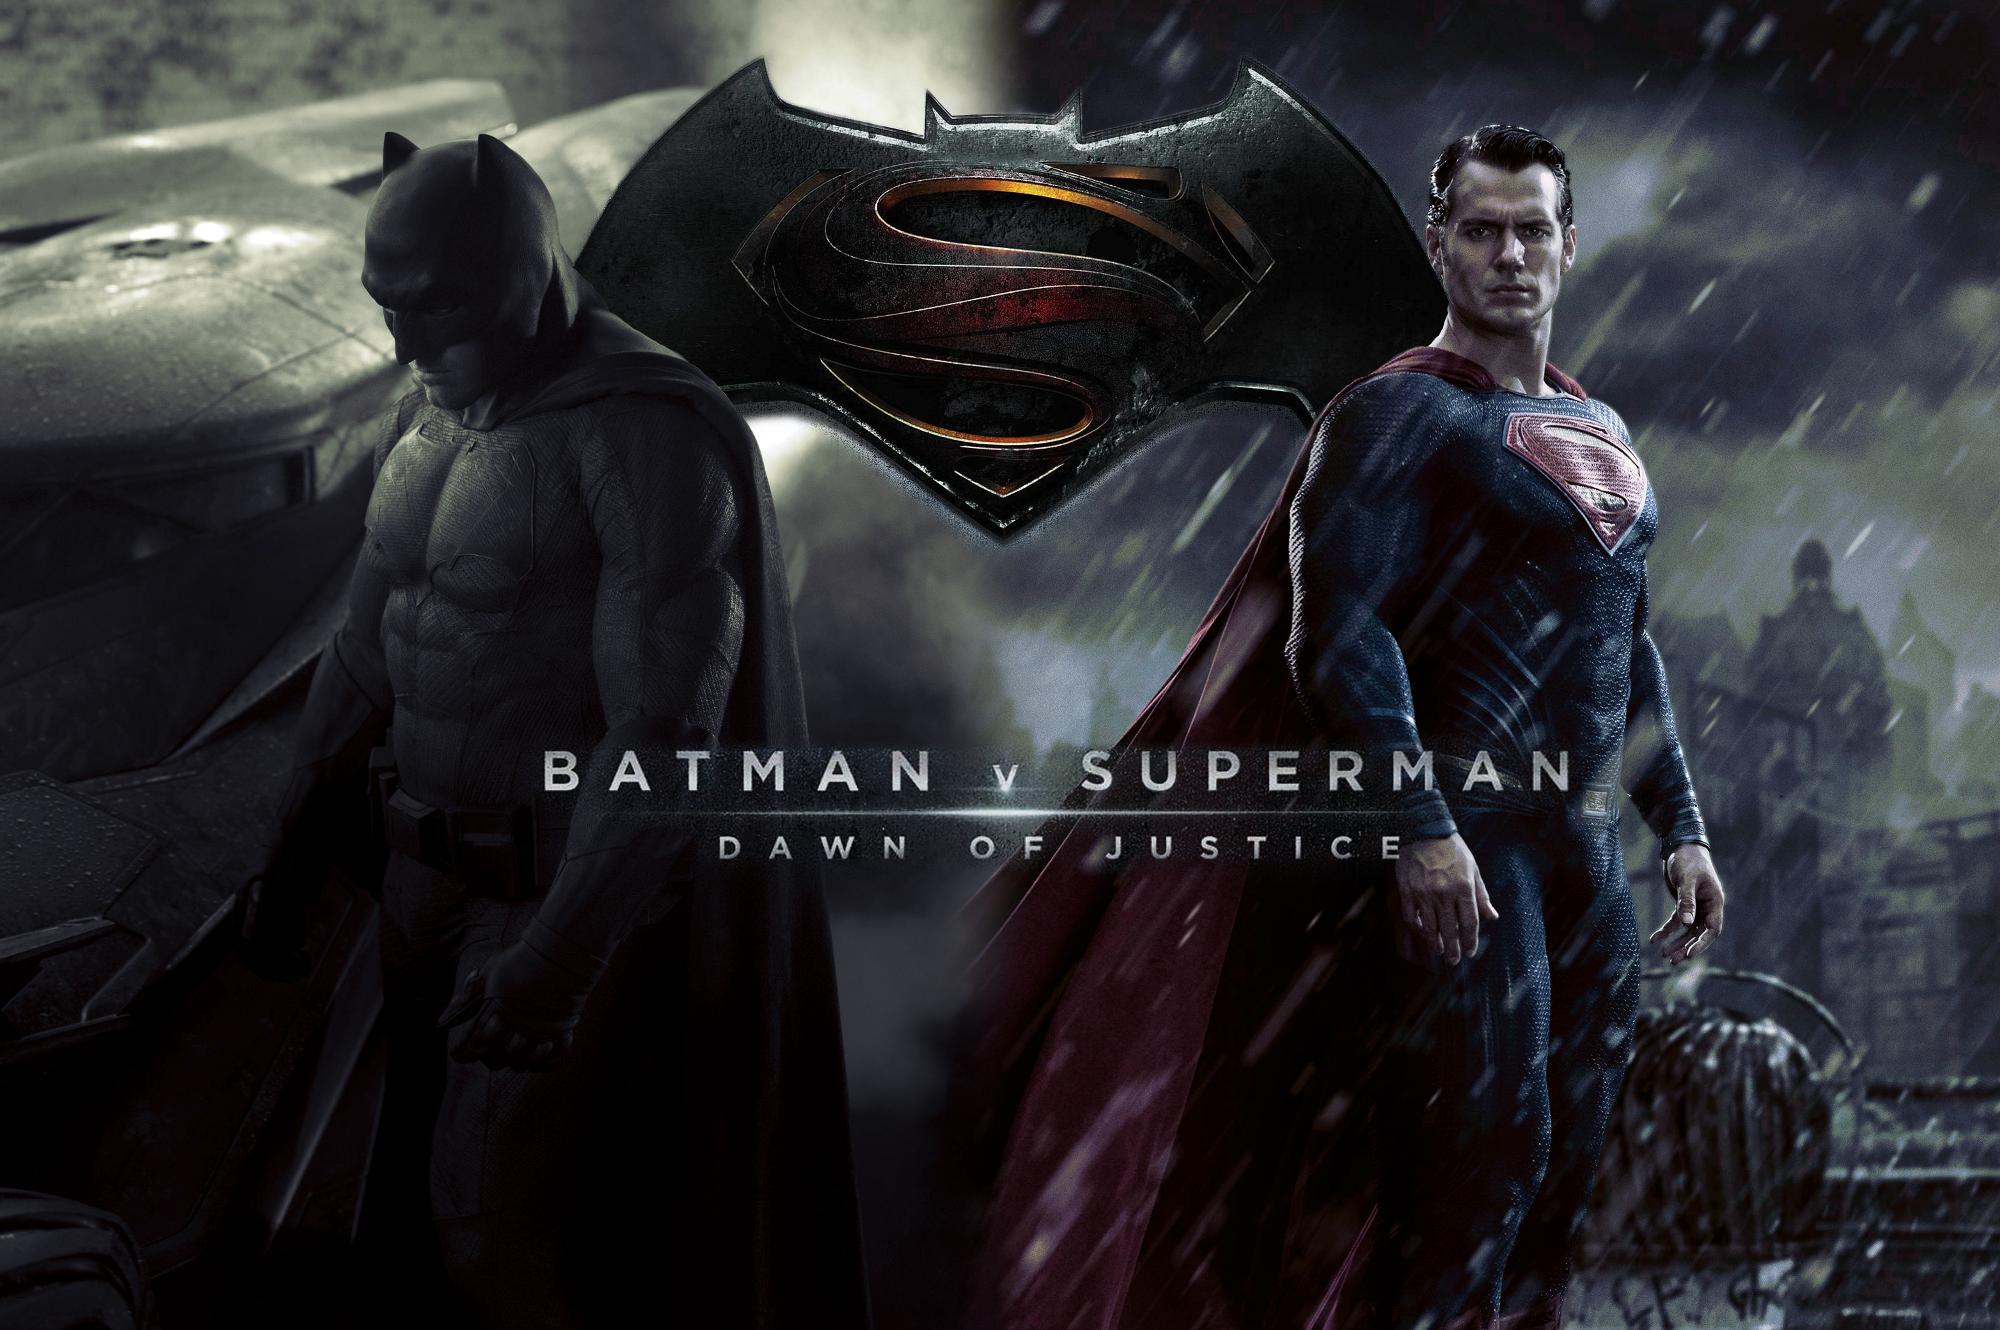 Batman Vs Superman Trailer 2